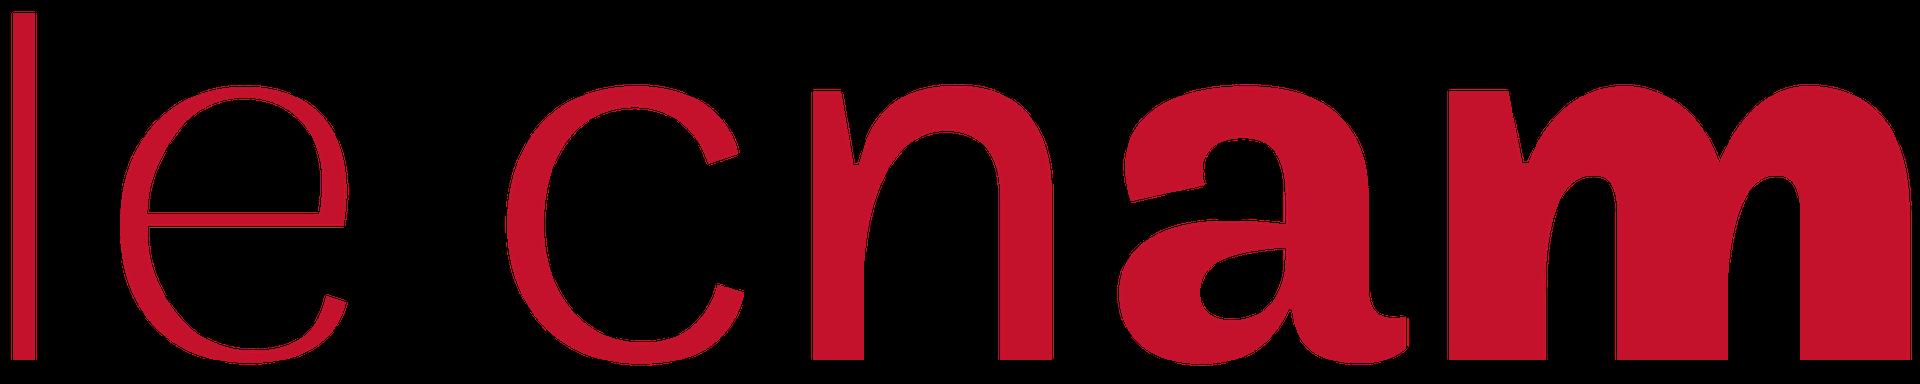 Logo 1492182213.png?ixlib=rb 1.1